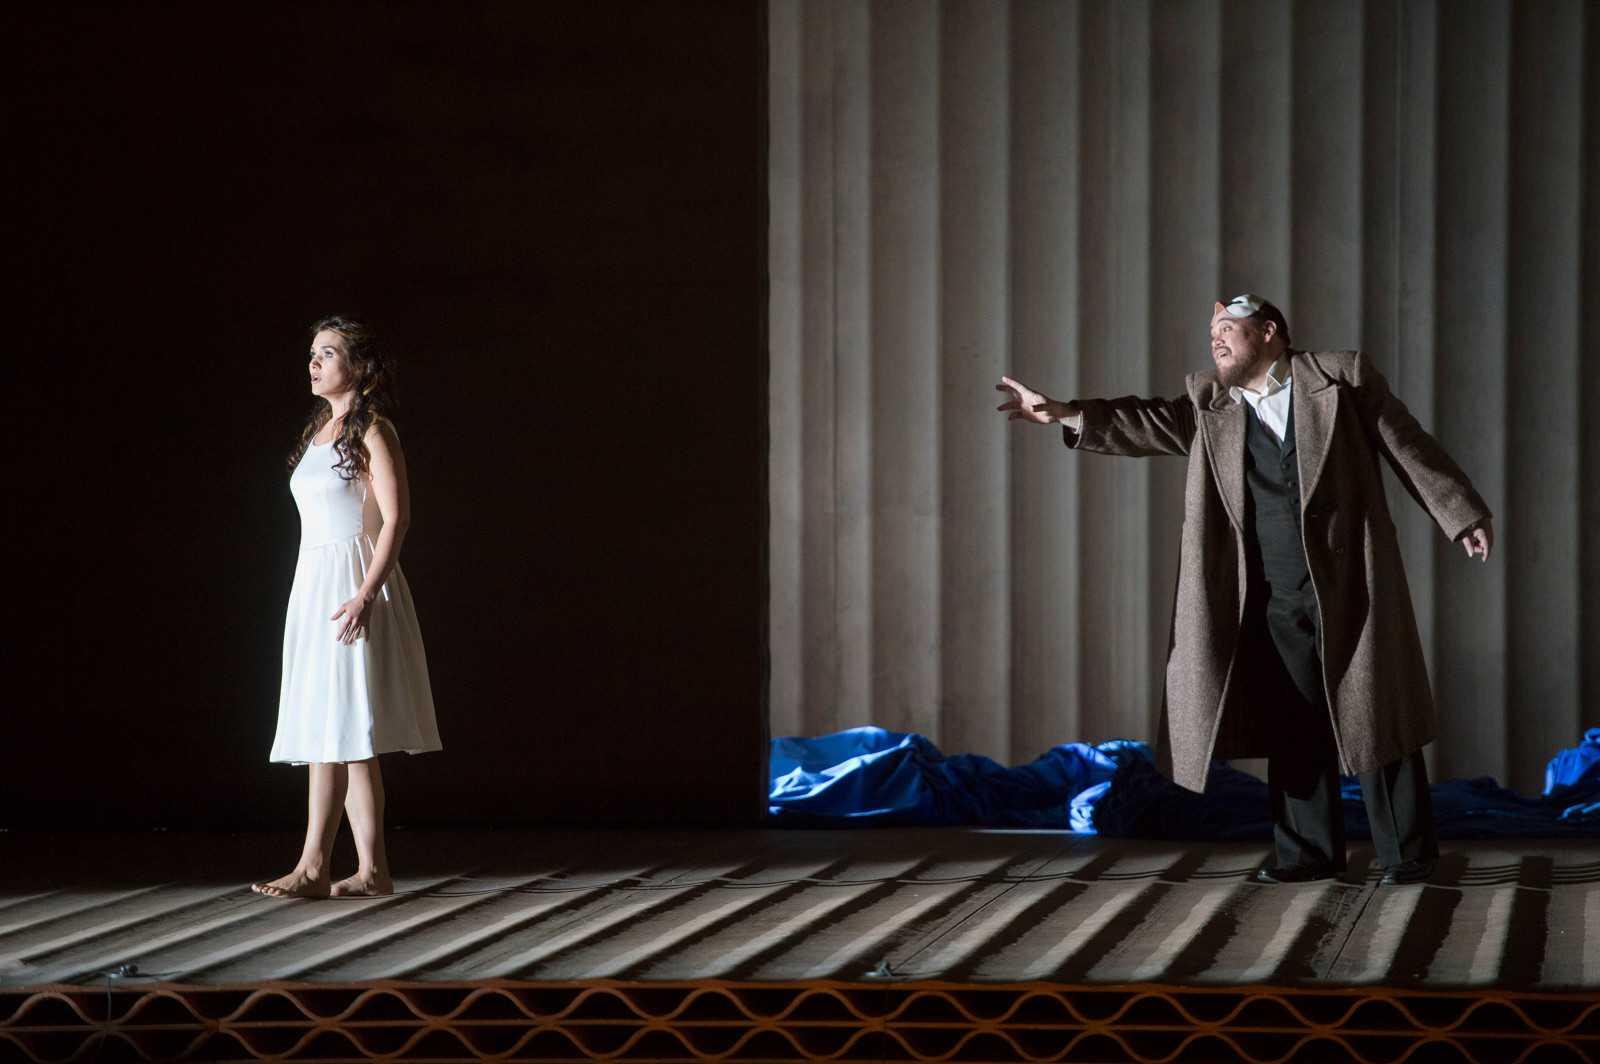 Monika Rittershaus / Opéra national de Paris